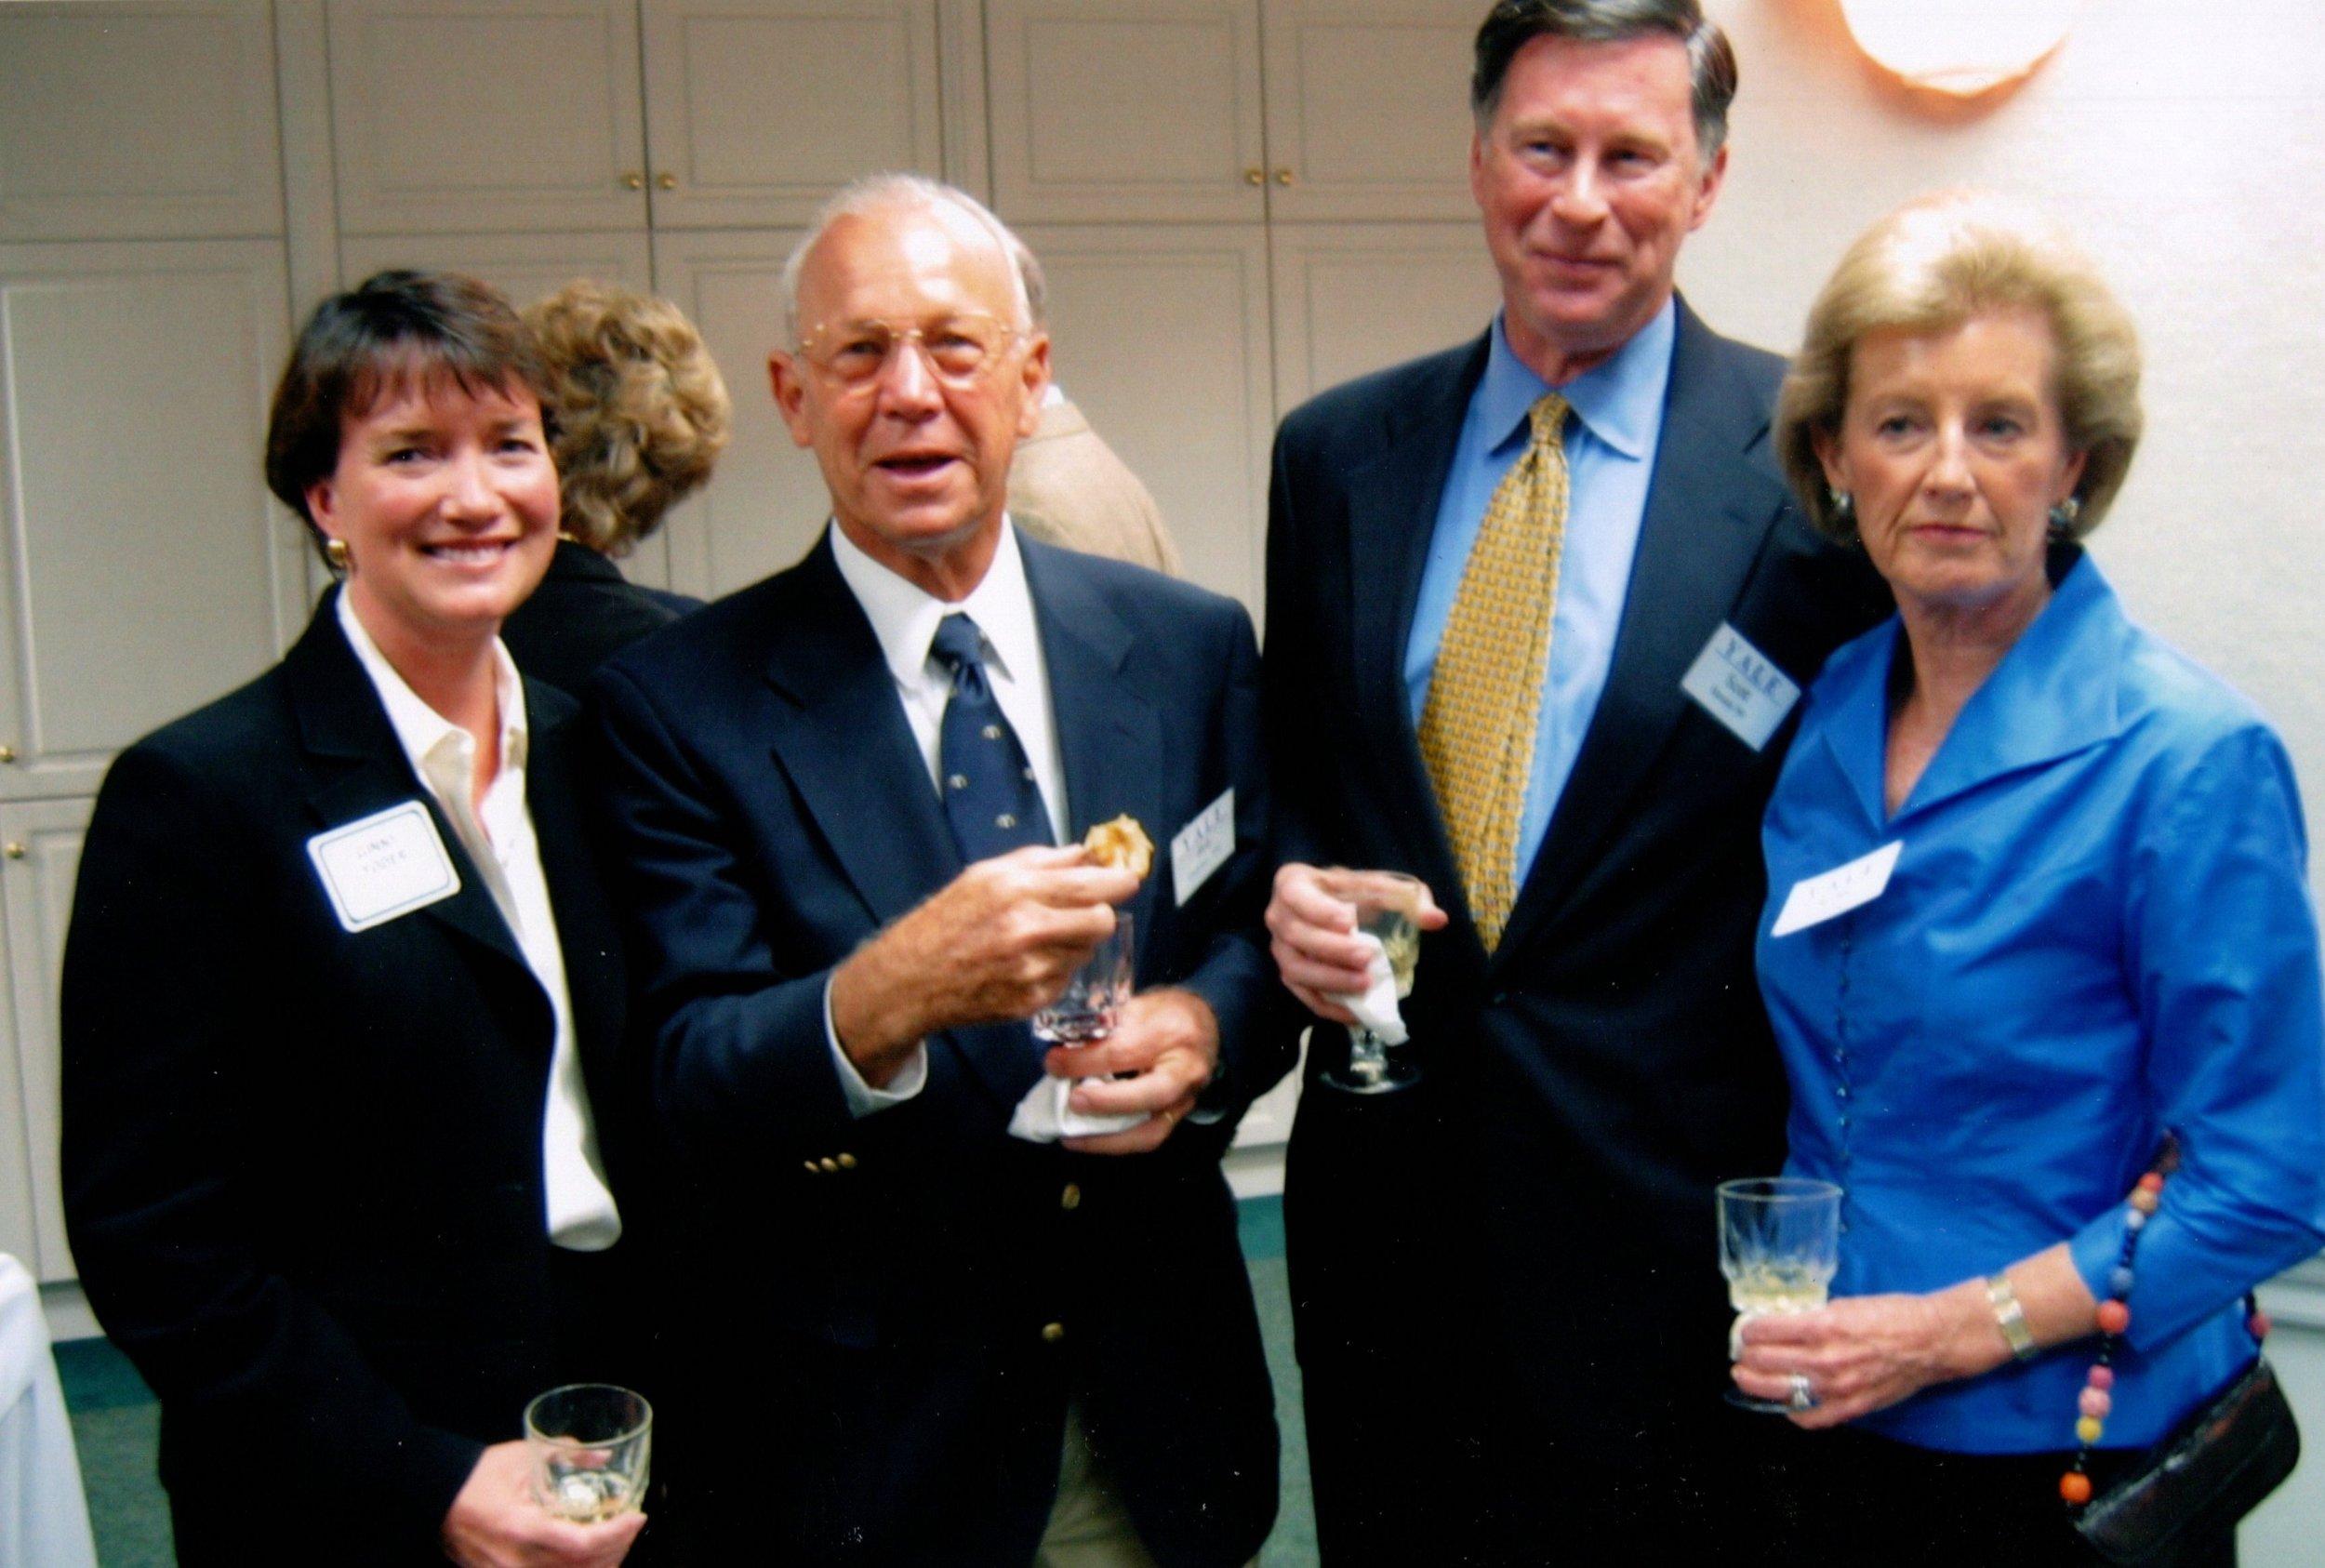 GINNY YODER, BOB HATTEMER, SCOTT HERSTIN, ROBIN WHEELER